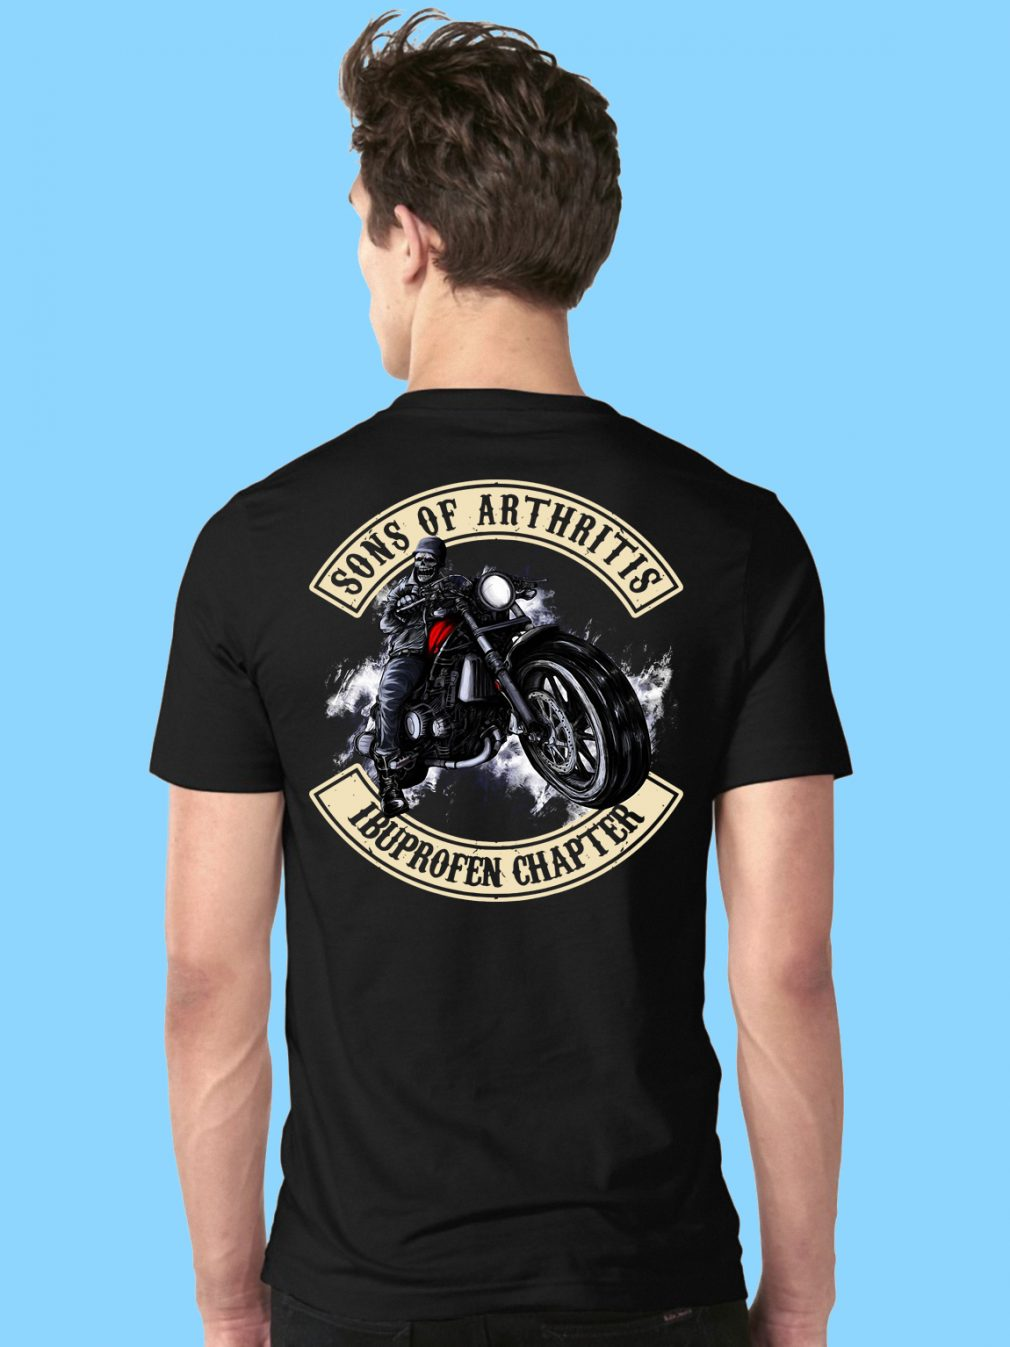 Official Sons of Arthritis Ibuprofen chapter shirt